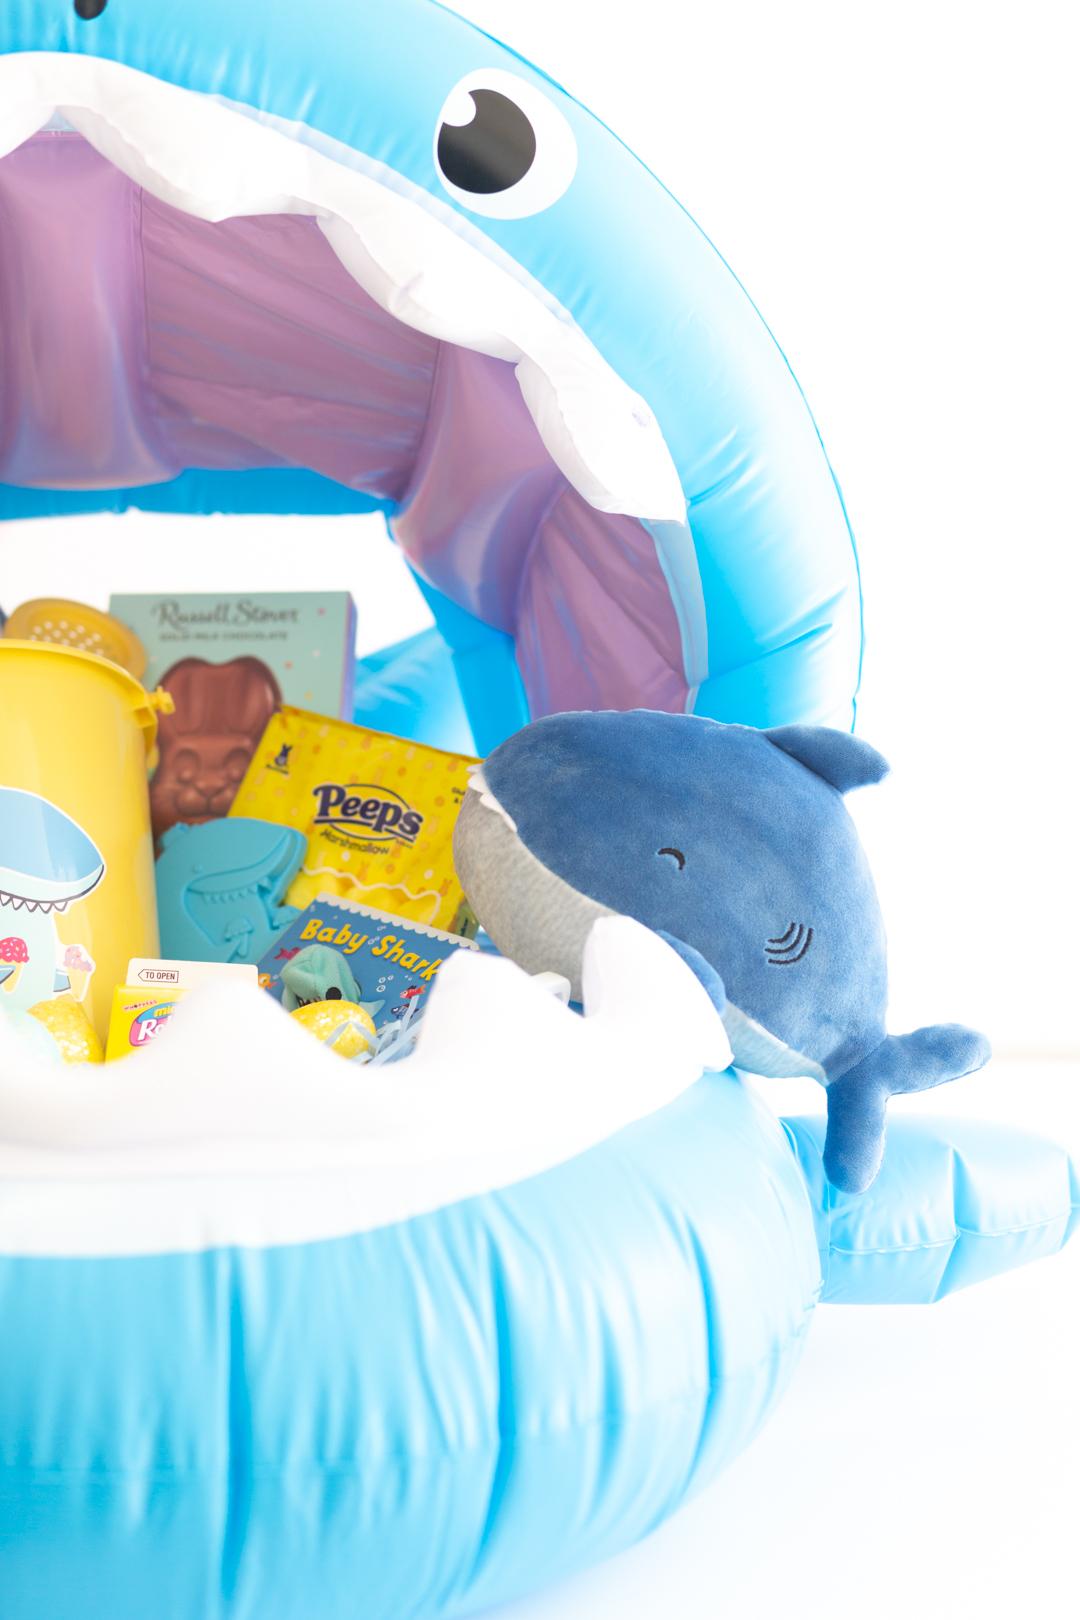 inside view of a shark themed gift basket with shark plush, shark pail set, shark book, peeps, easter bunny